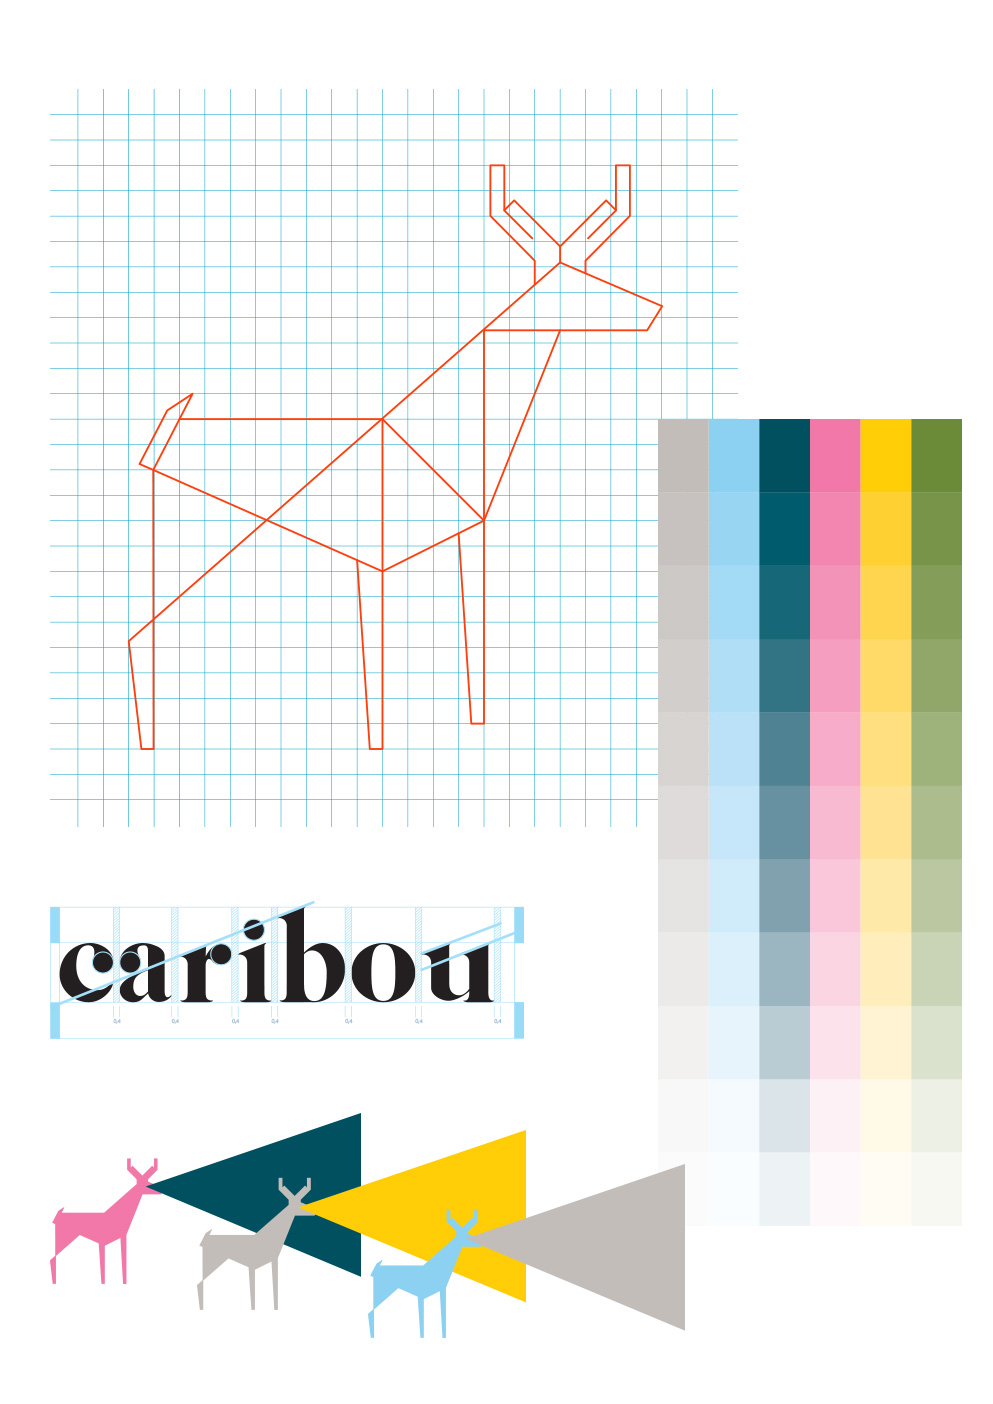 makebardo-caribou-3.jpg